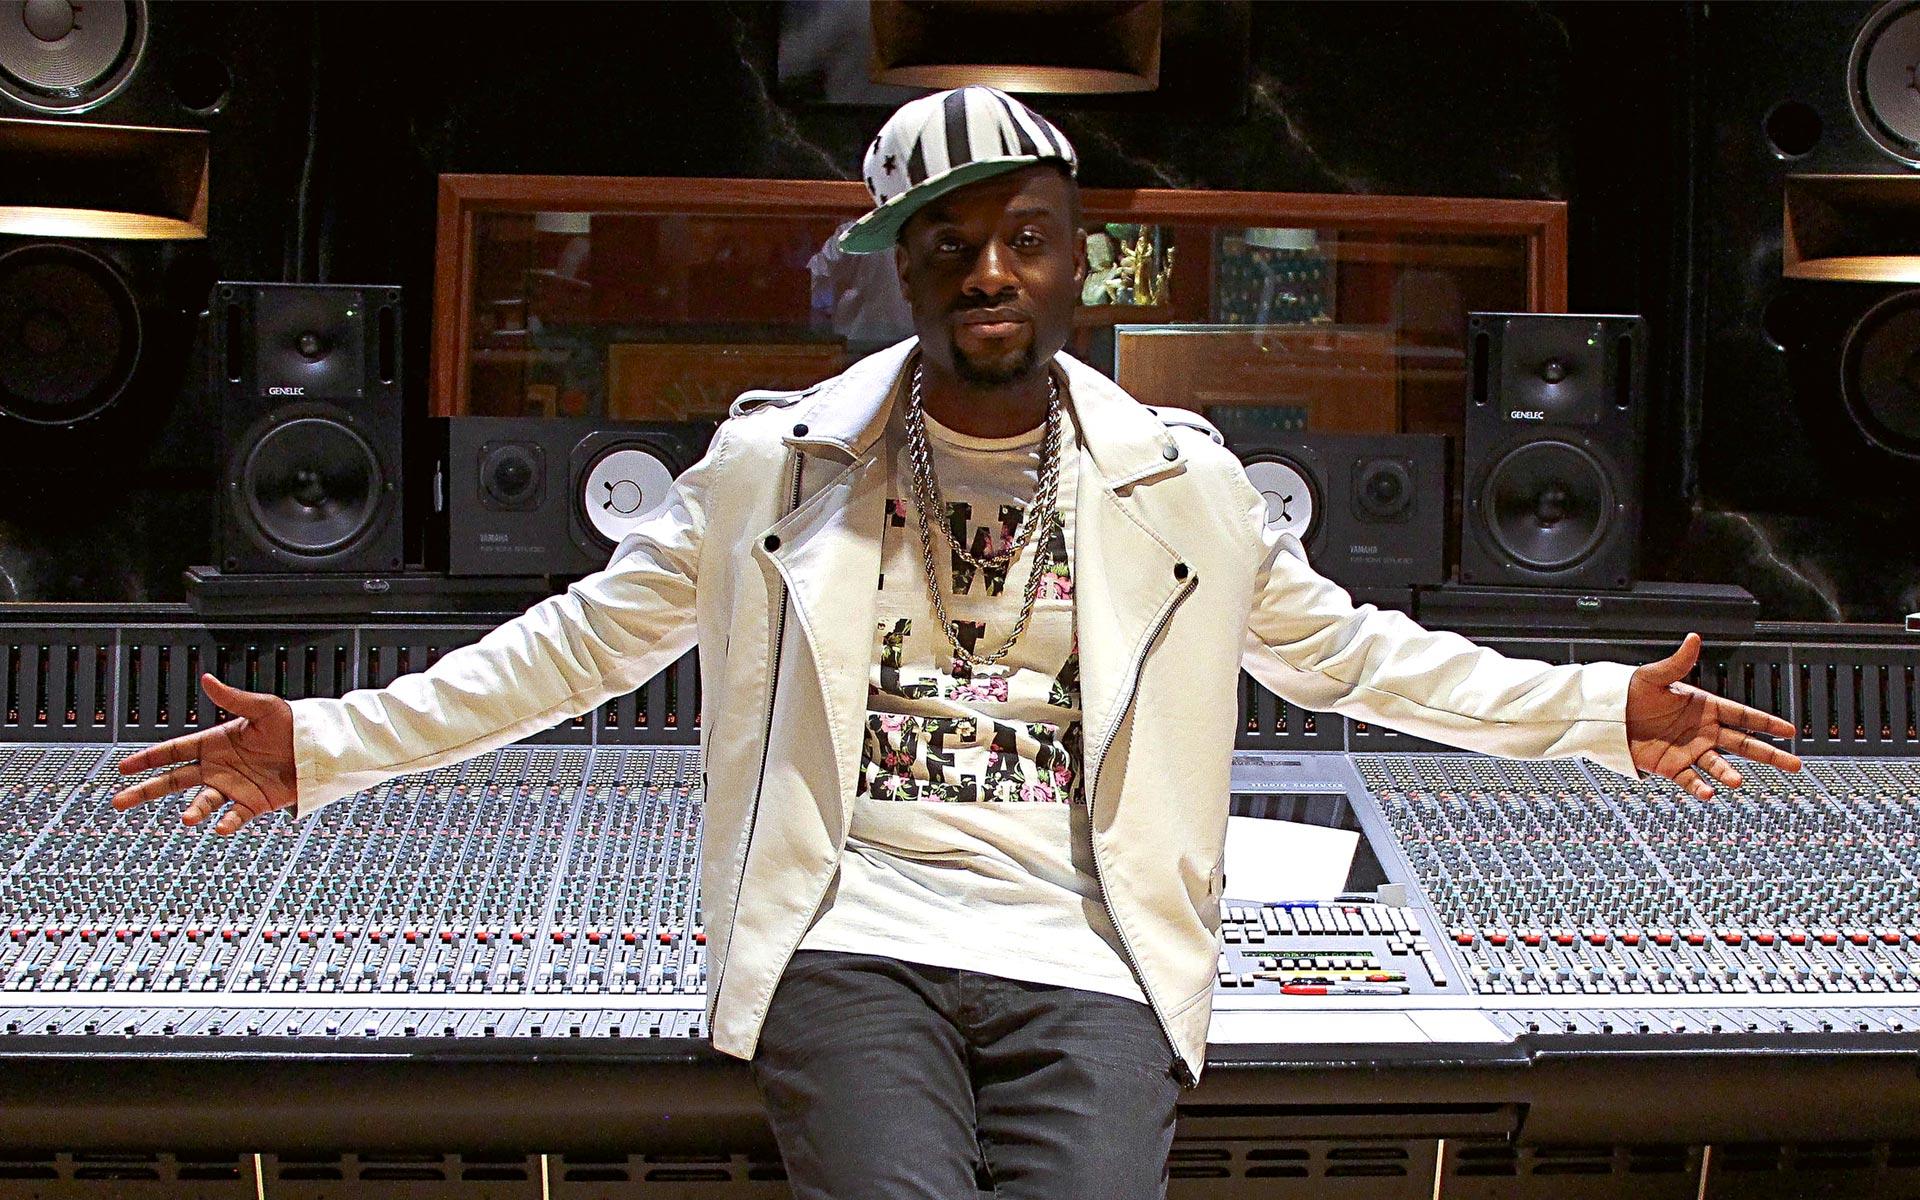 Shalom 'J.Storm' Miller on Beyoncé, Missy Elliott, Bad Boy Records, BMI, and Artist Management